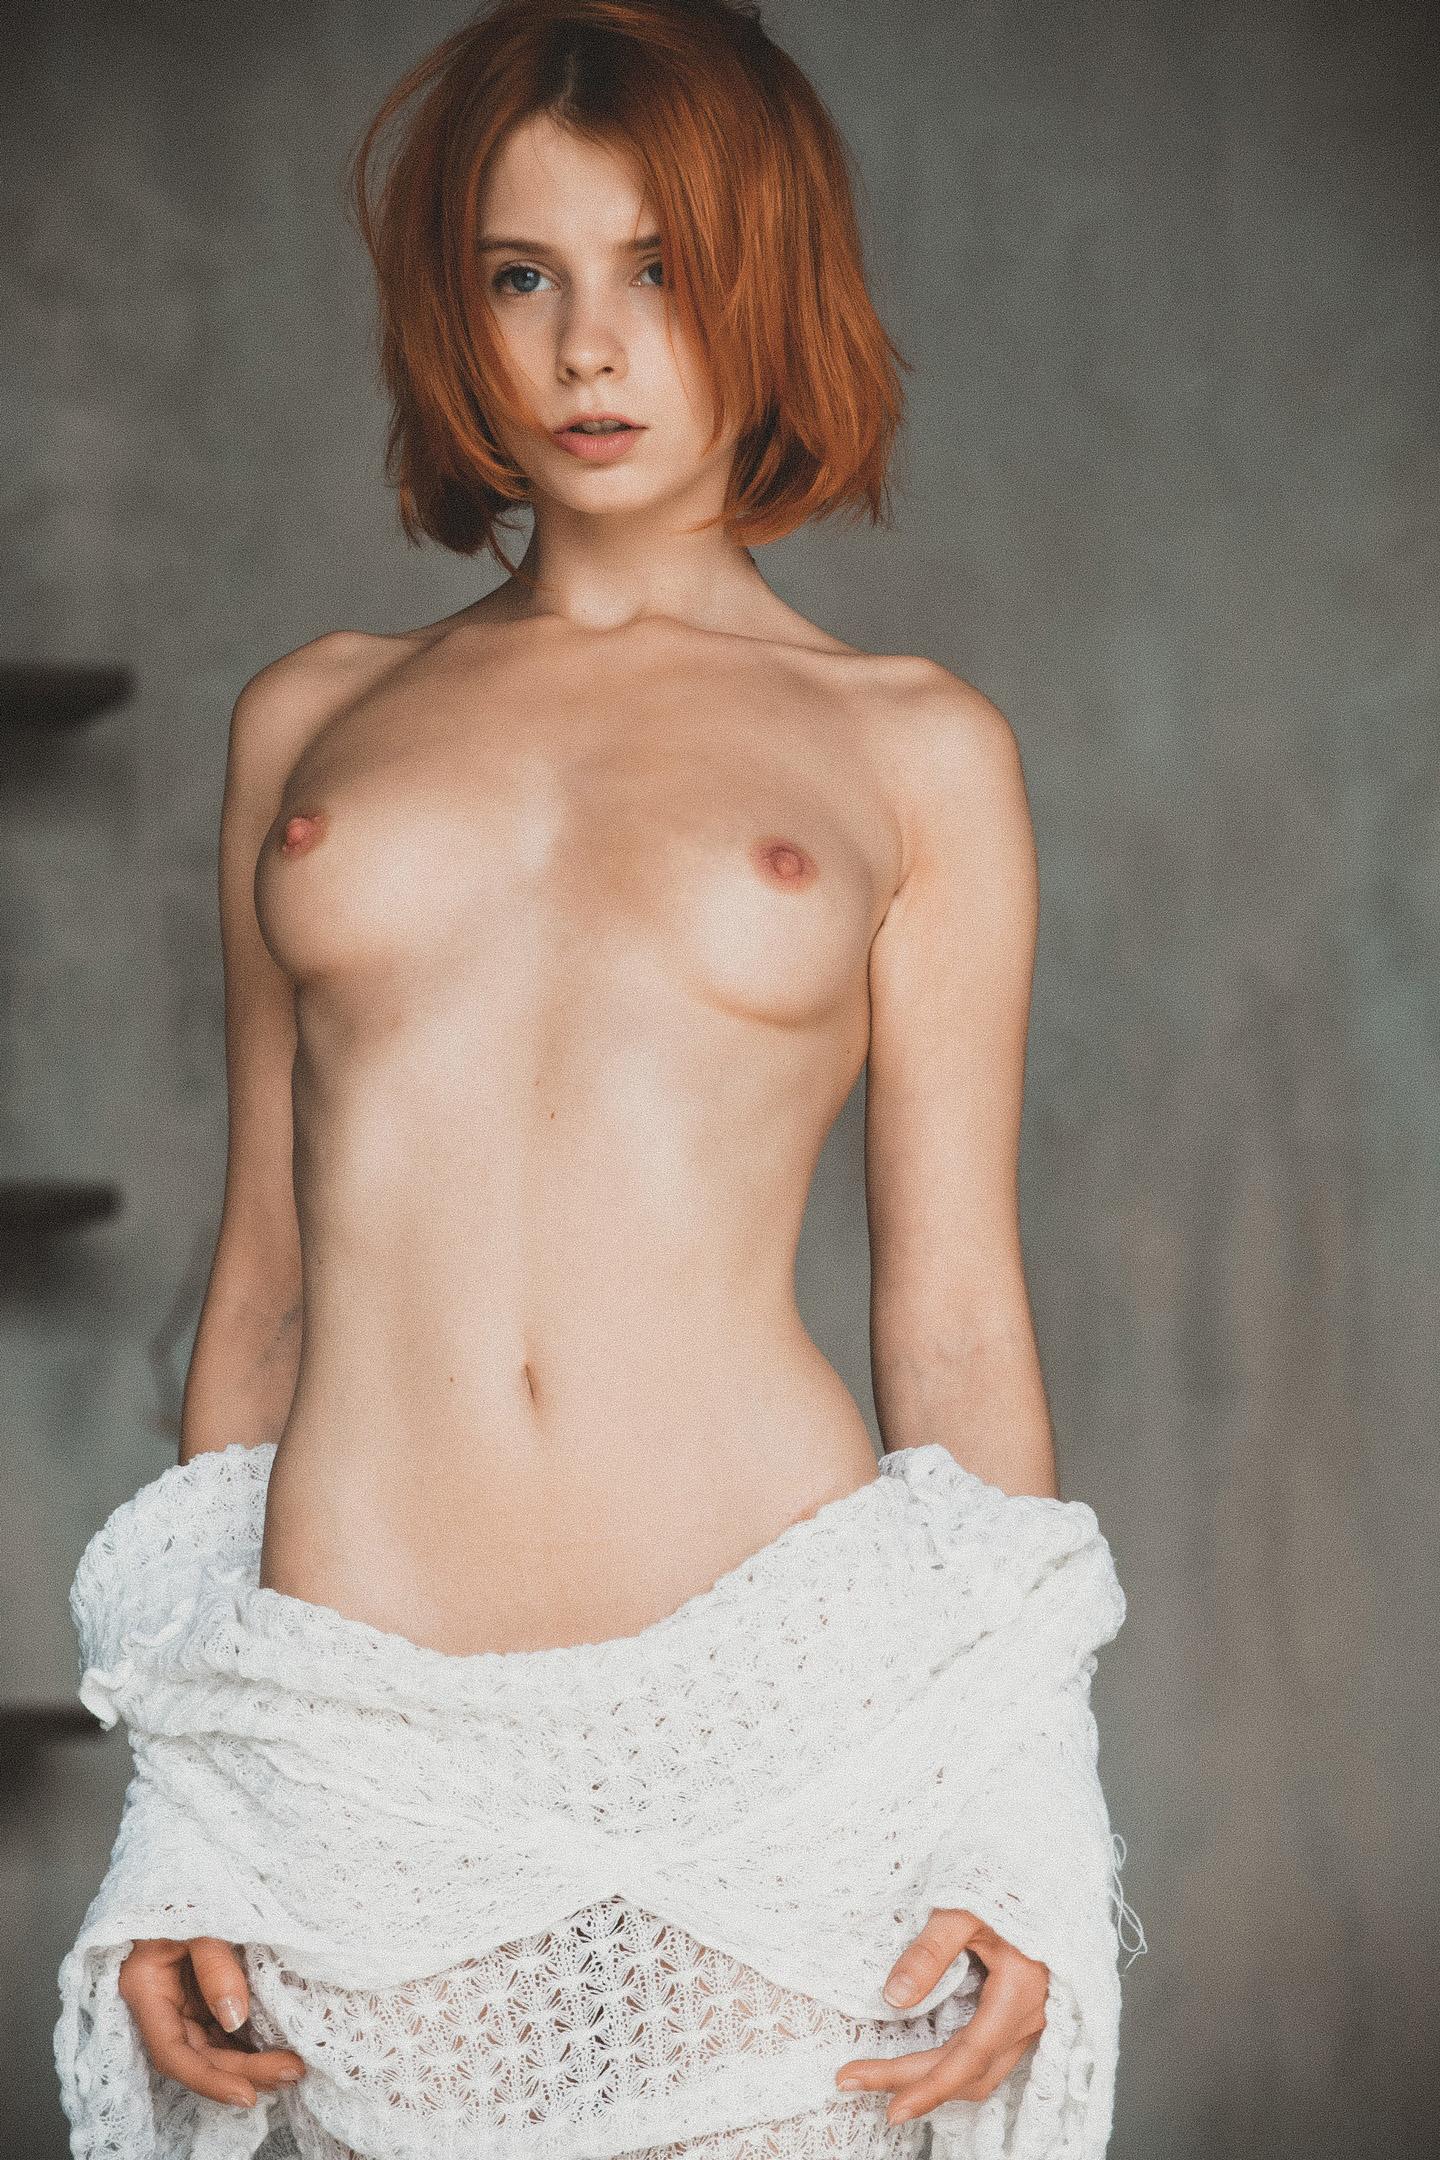 Marta Gromova - Andy Goodlight photoshoot